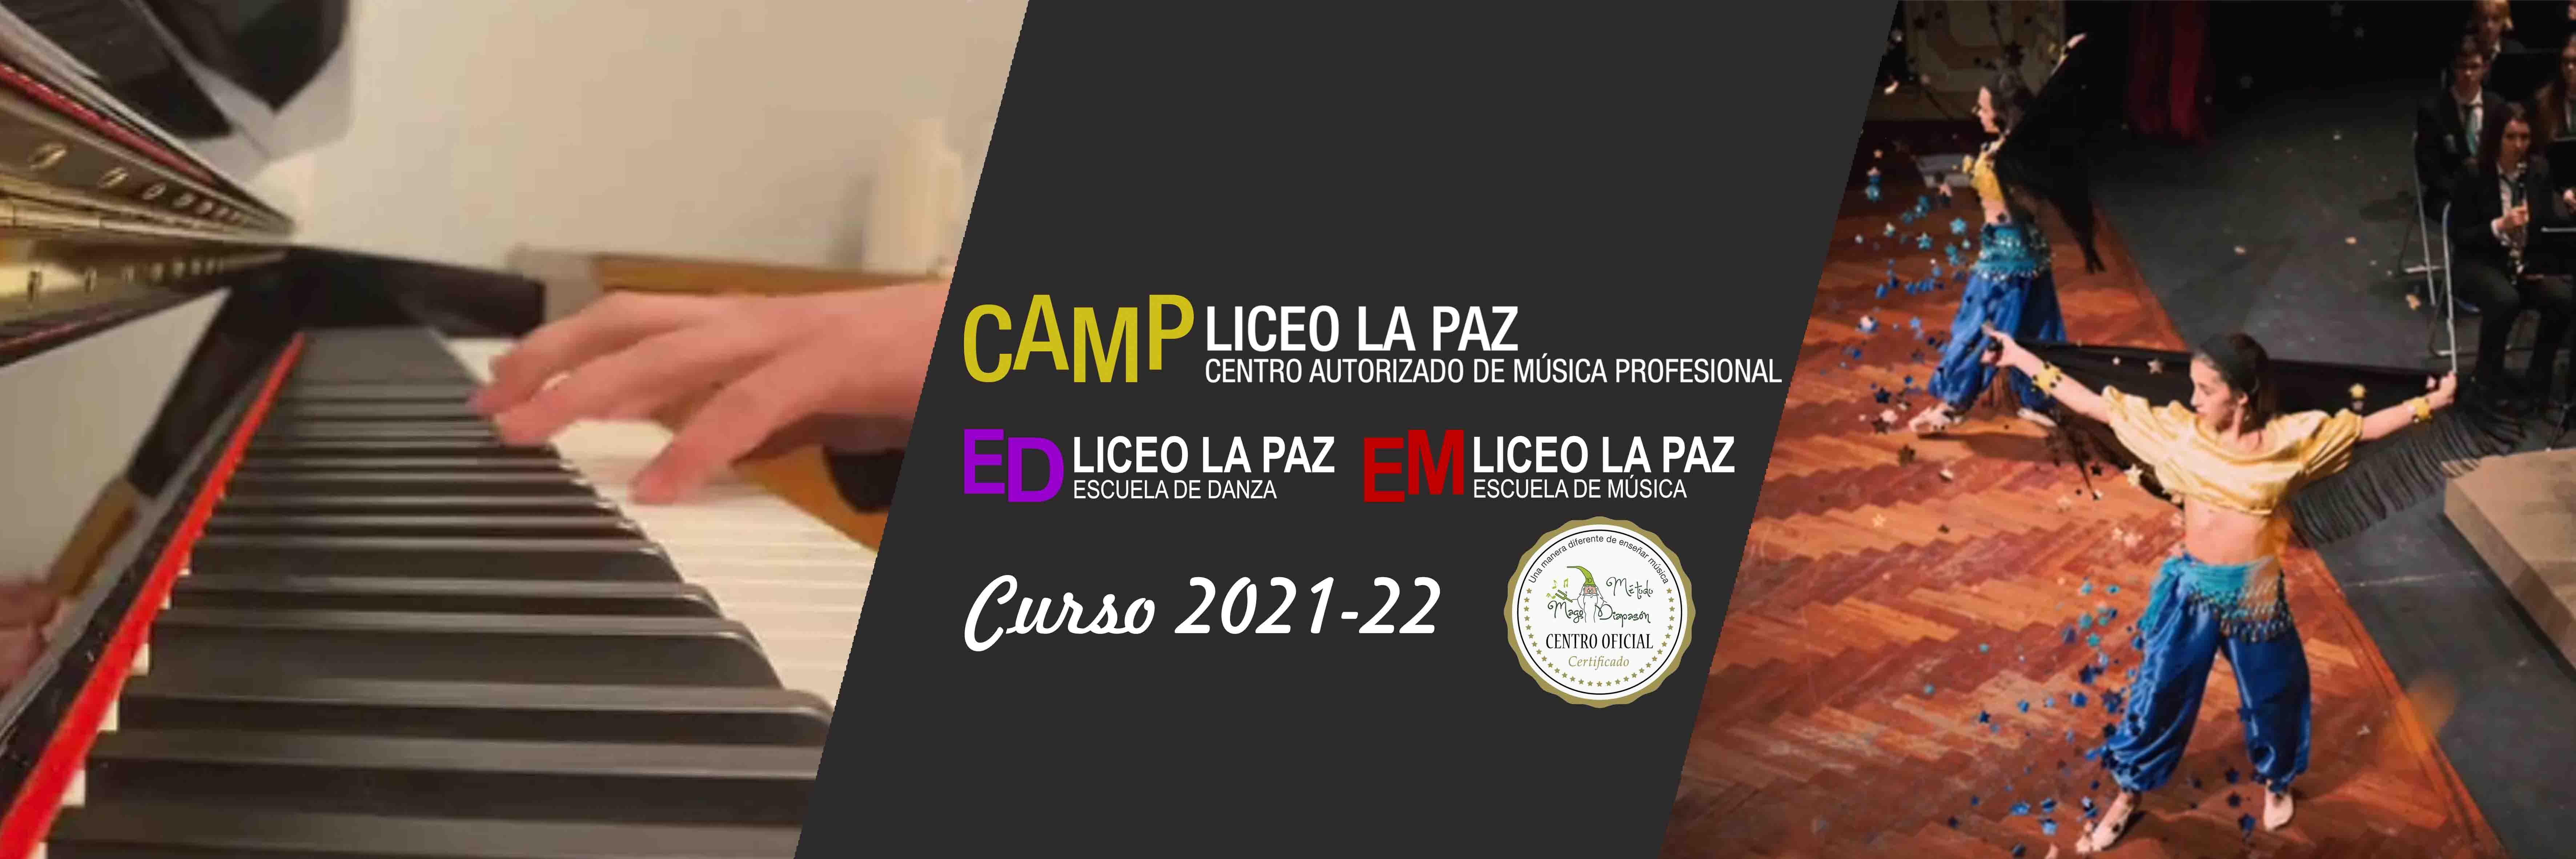 852x284_slide-CAMP